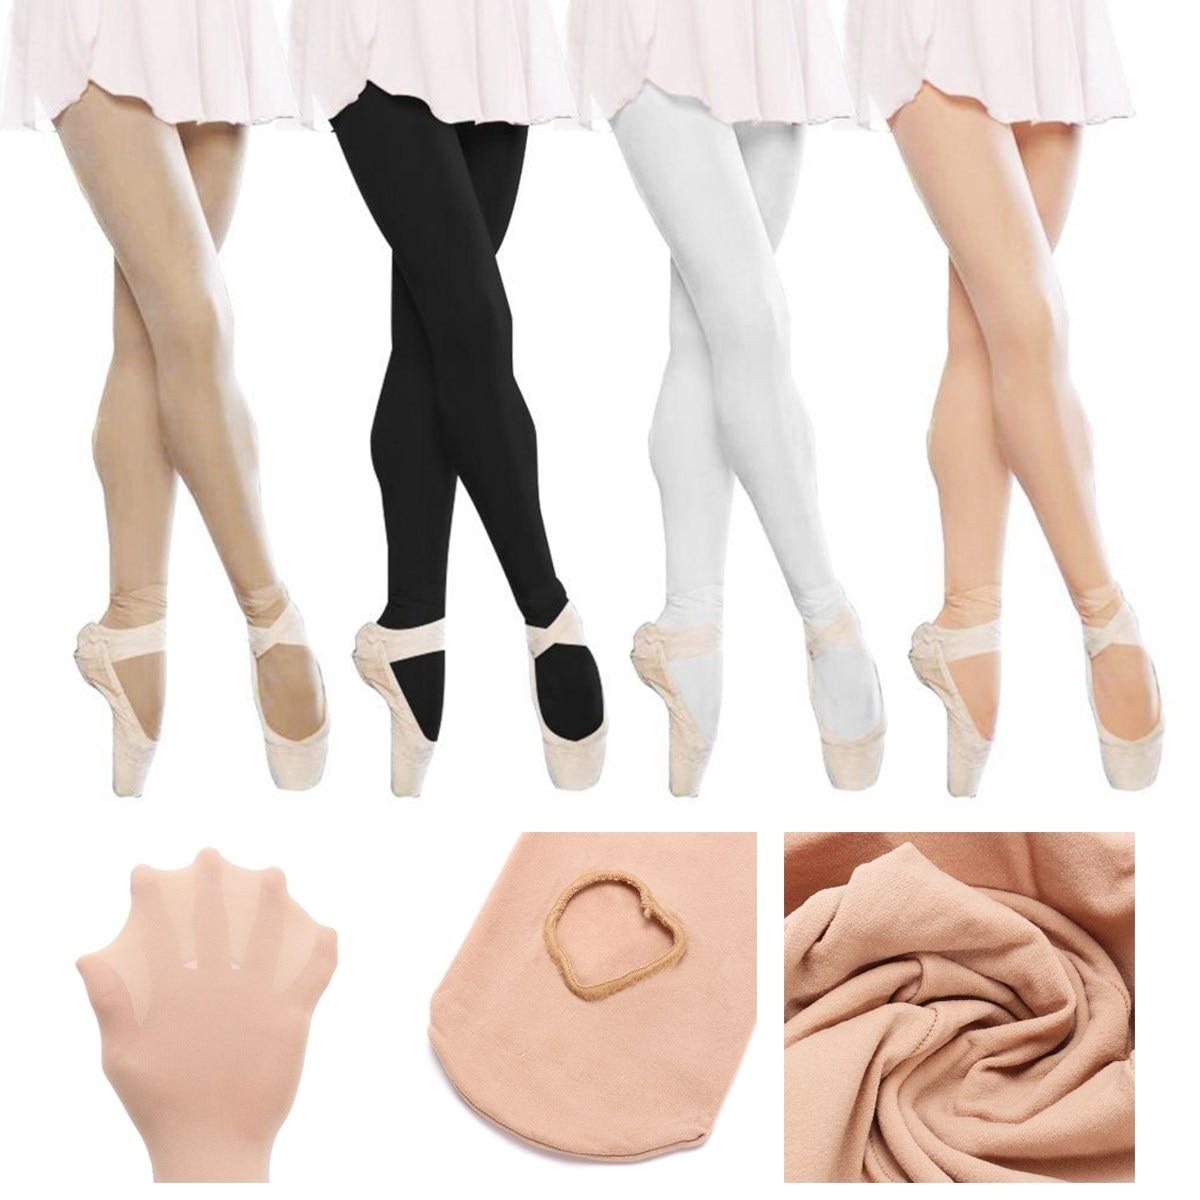 Children Girls Convertible Tights Ballet Dance Stocking Socks Ballet Pantyhose Gymnastics Leotards Kids Ladies Tap Dance Tights